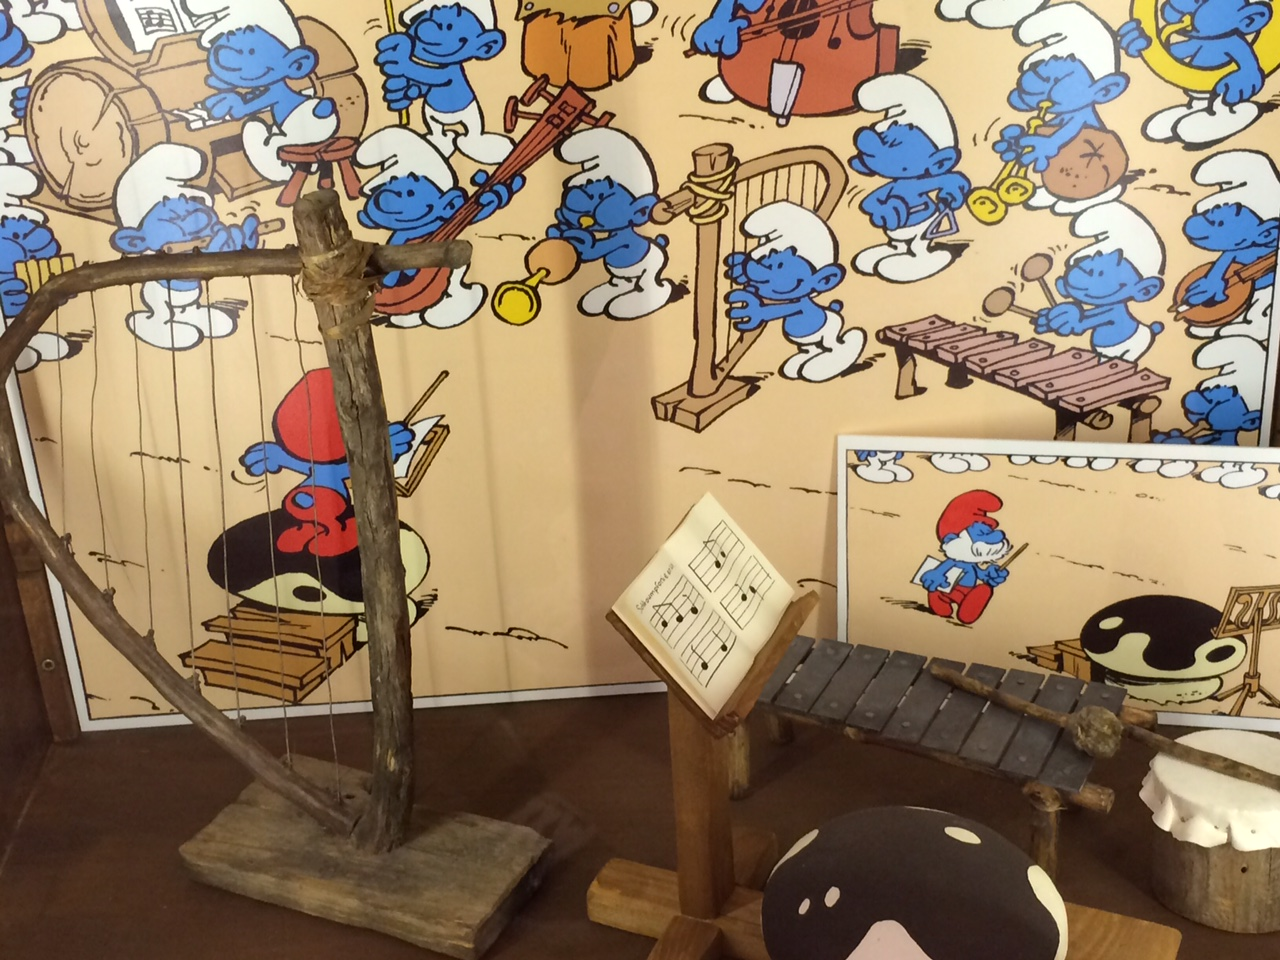 bruxelles_musée_de_la_BD_fev_2016_schtroumpf (3)